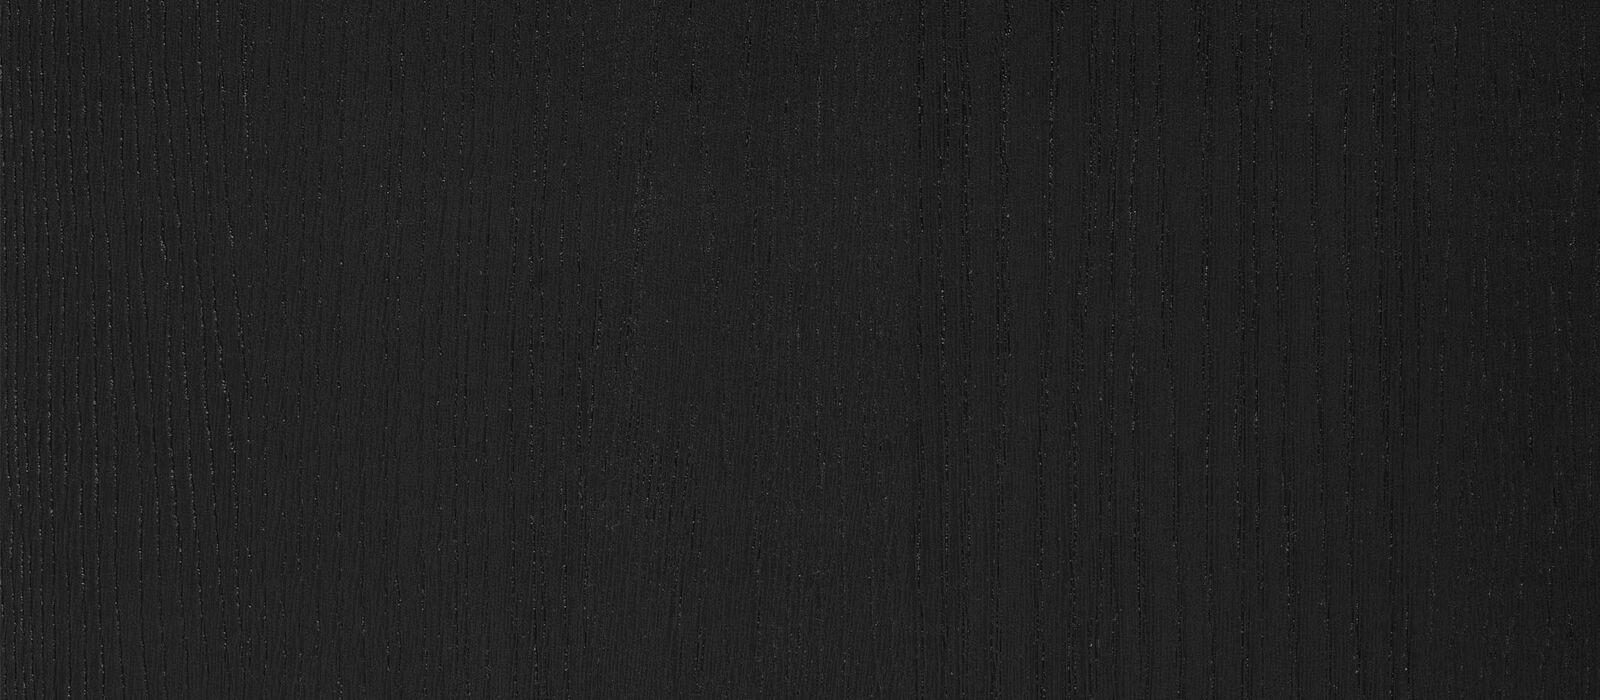 colore str. indigo             0,45 1440